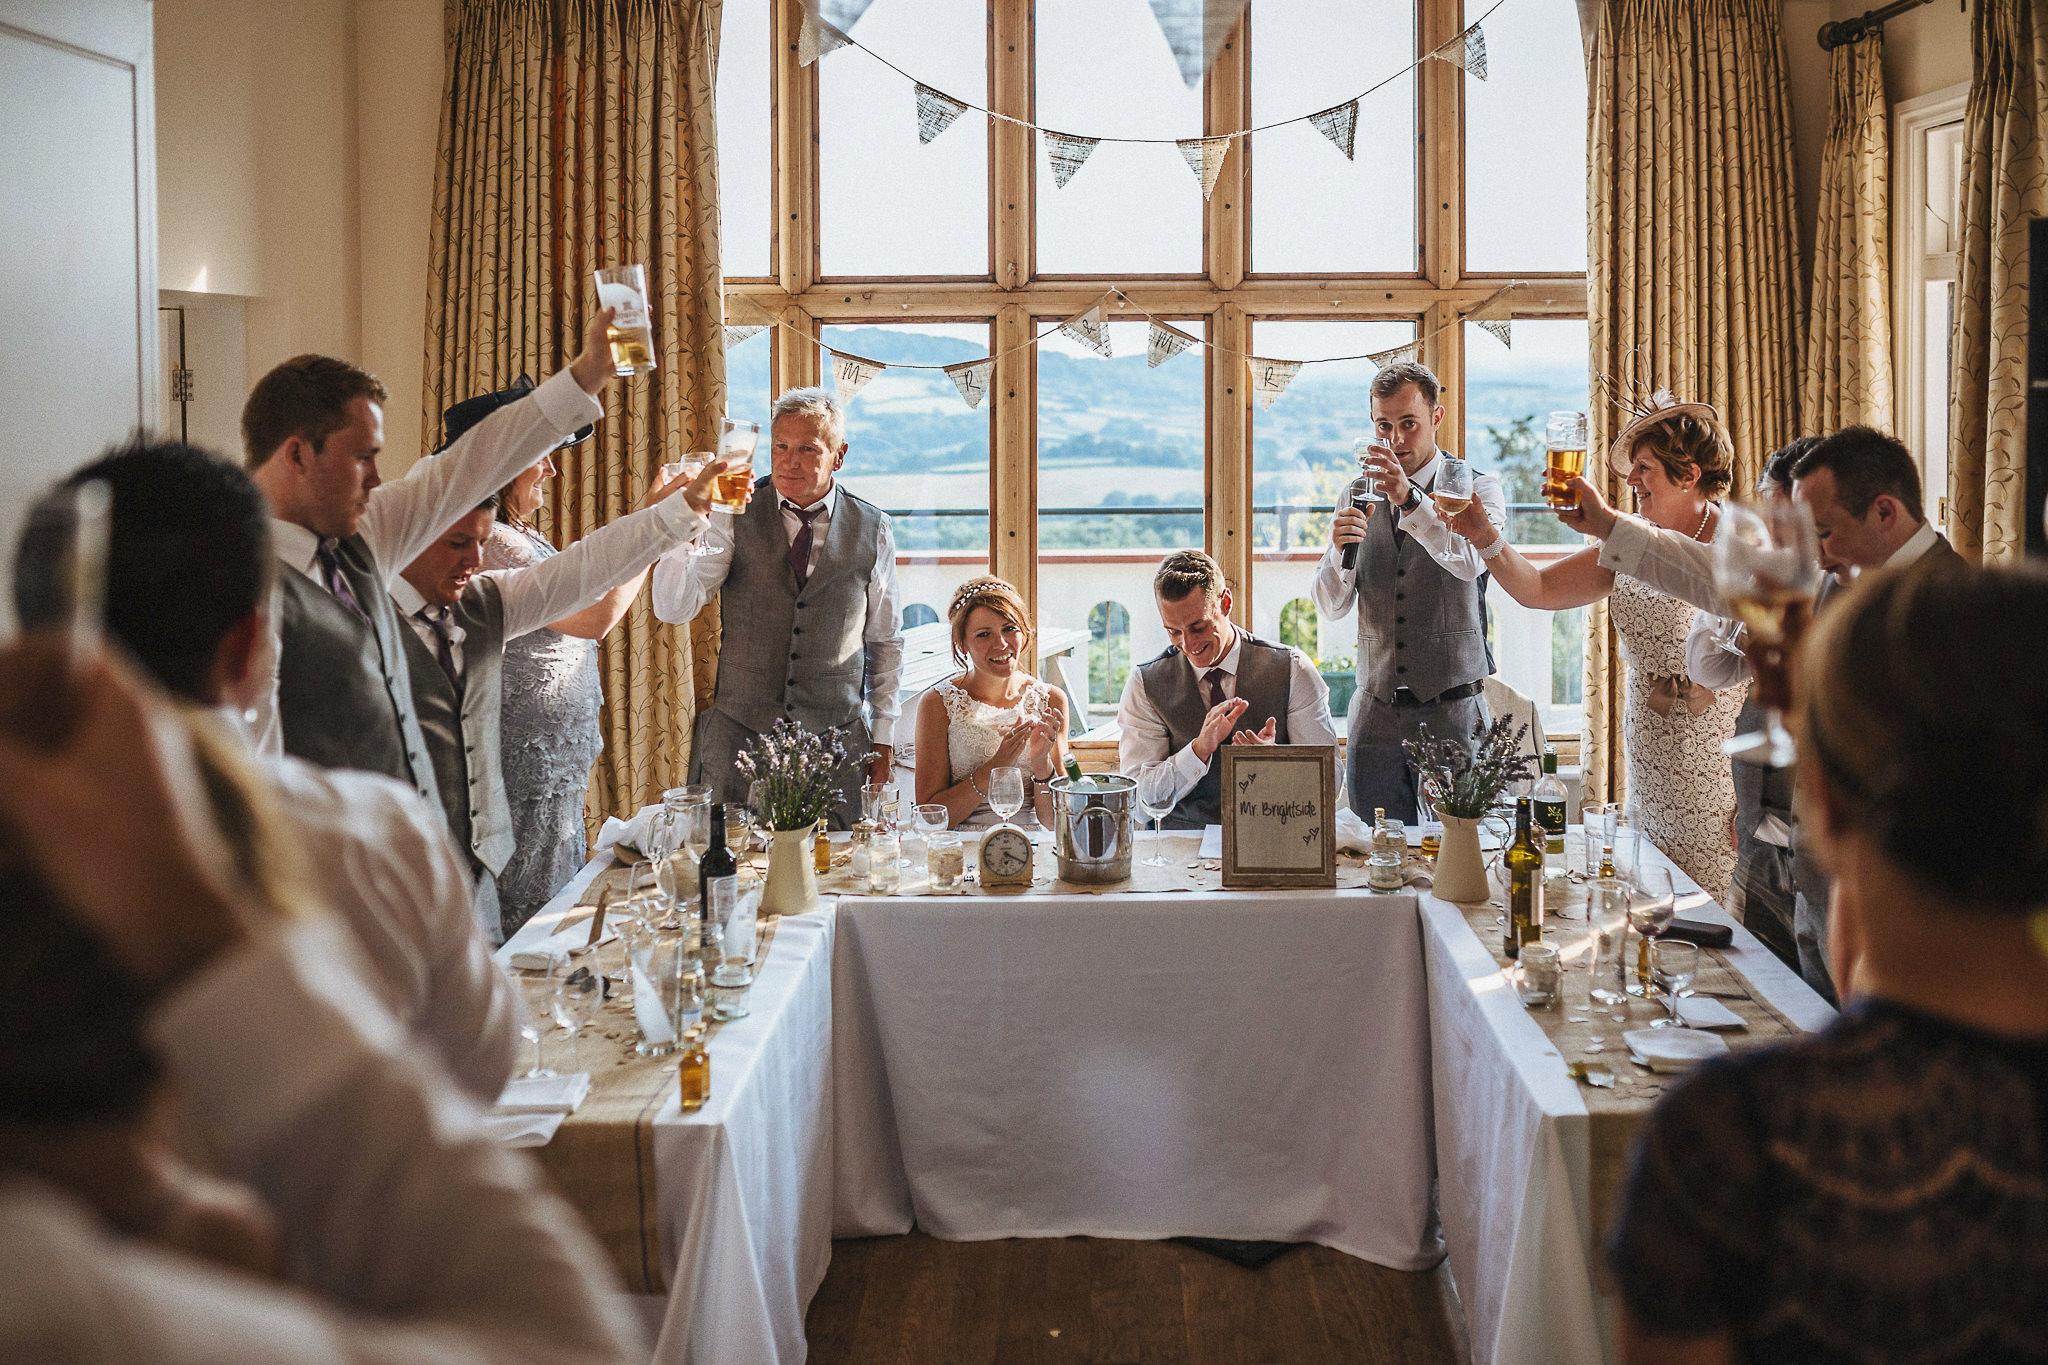 paul-marbrook-Caer-Llan-Wedding-Photographer-90083